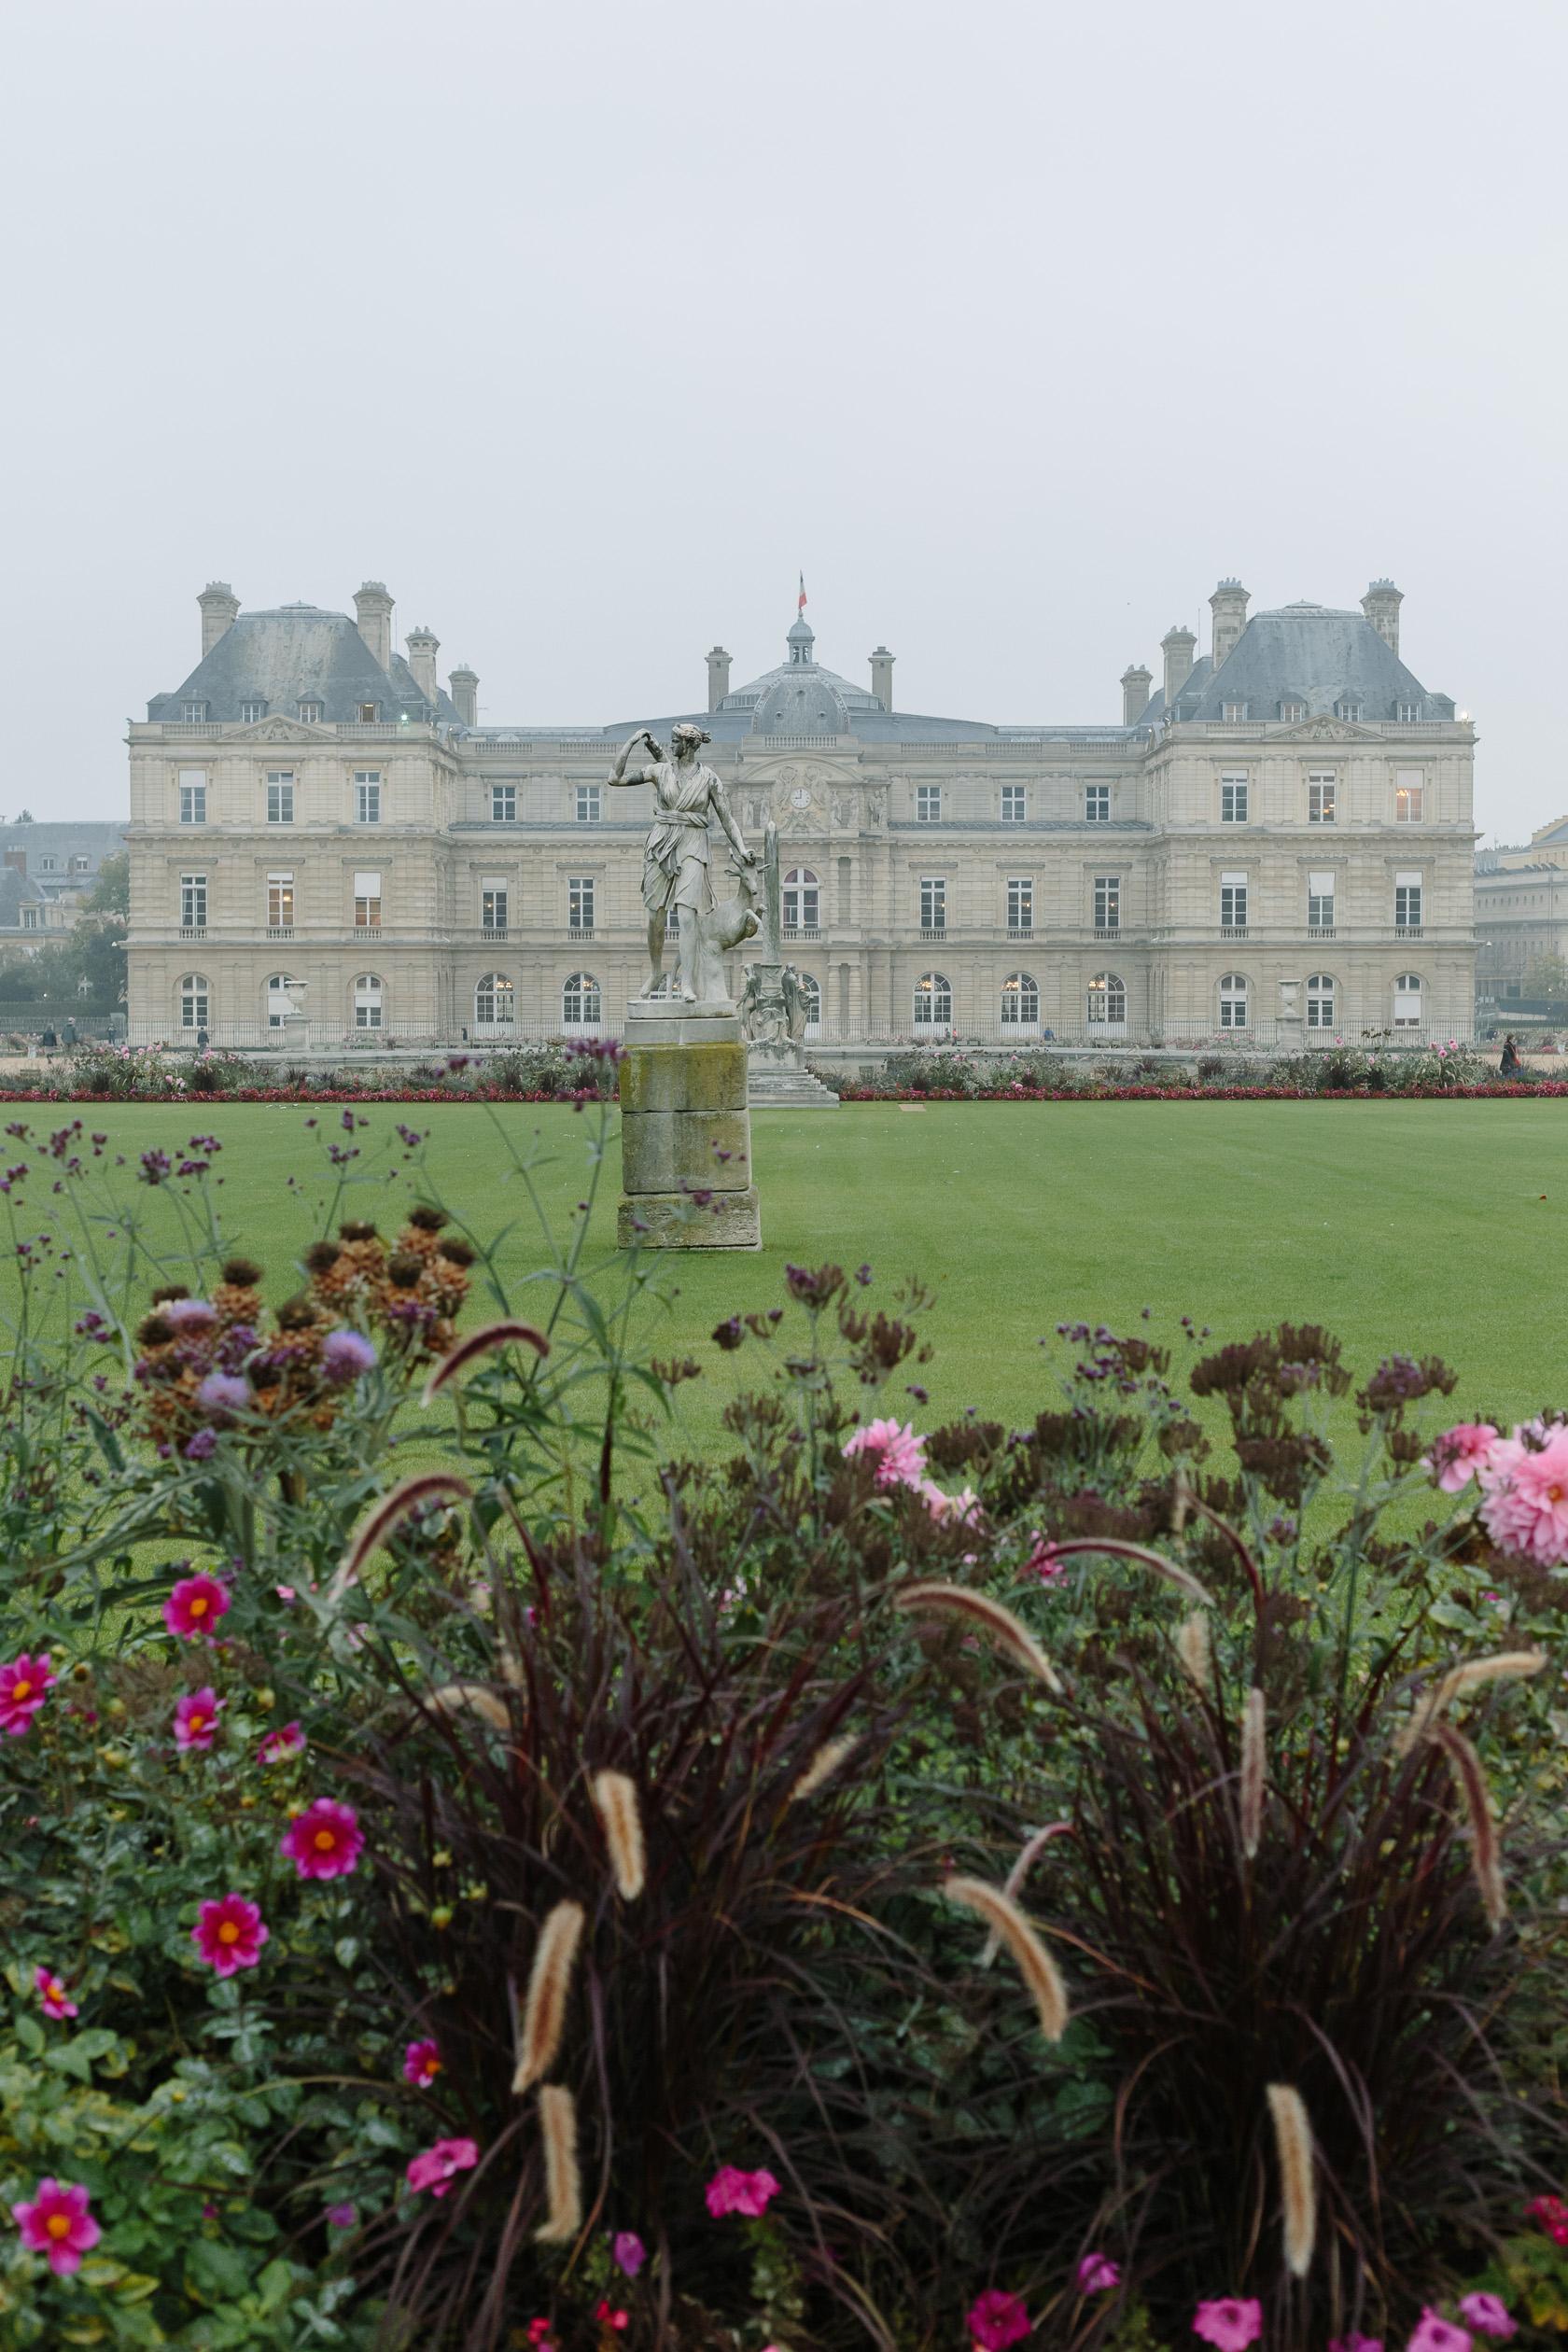 jardin-du-luxembourg-paris-4904